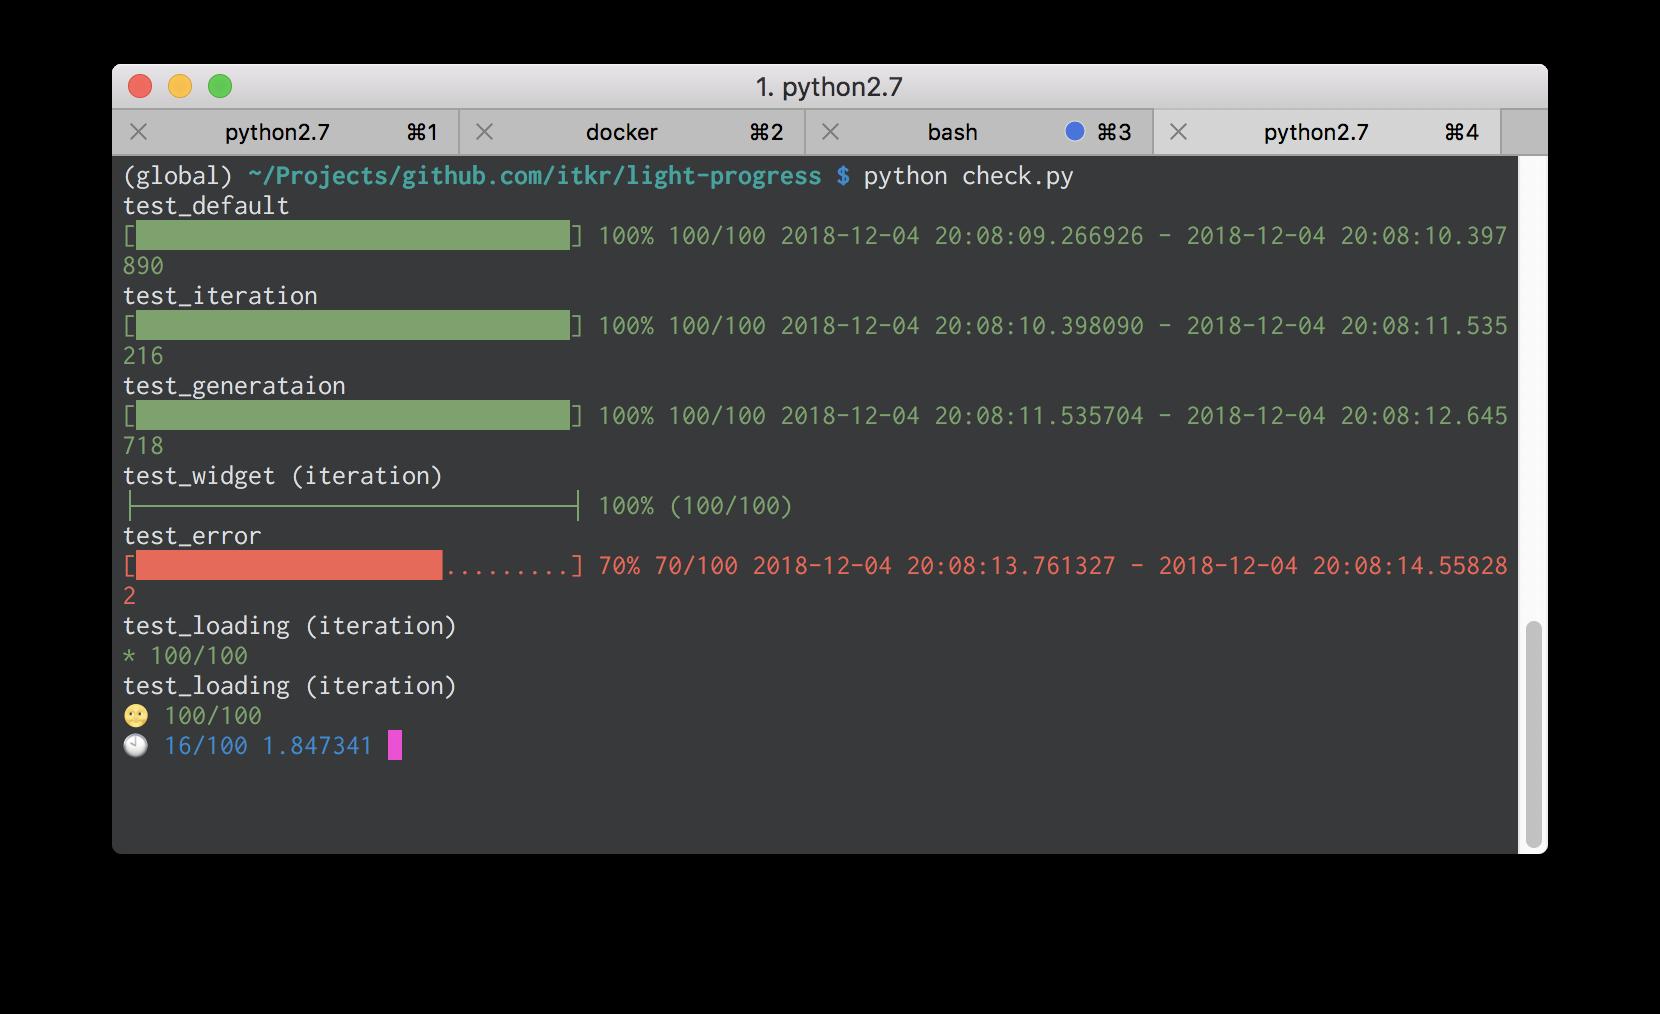 Pythonで `light-progress` を使って進捗(プログレスバー)を表示